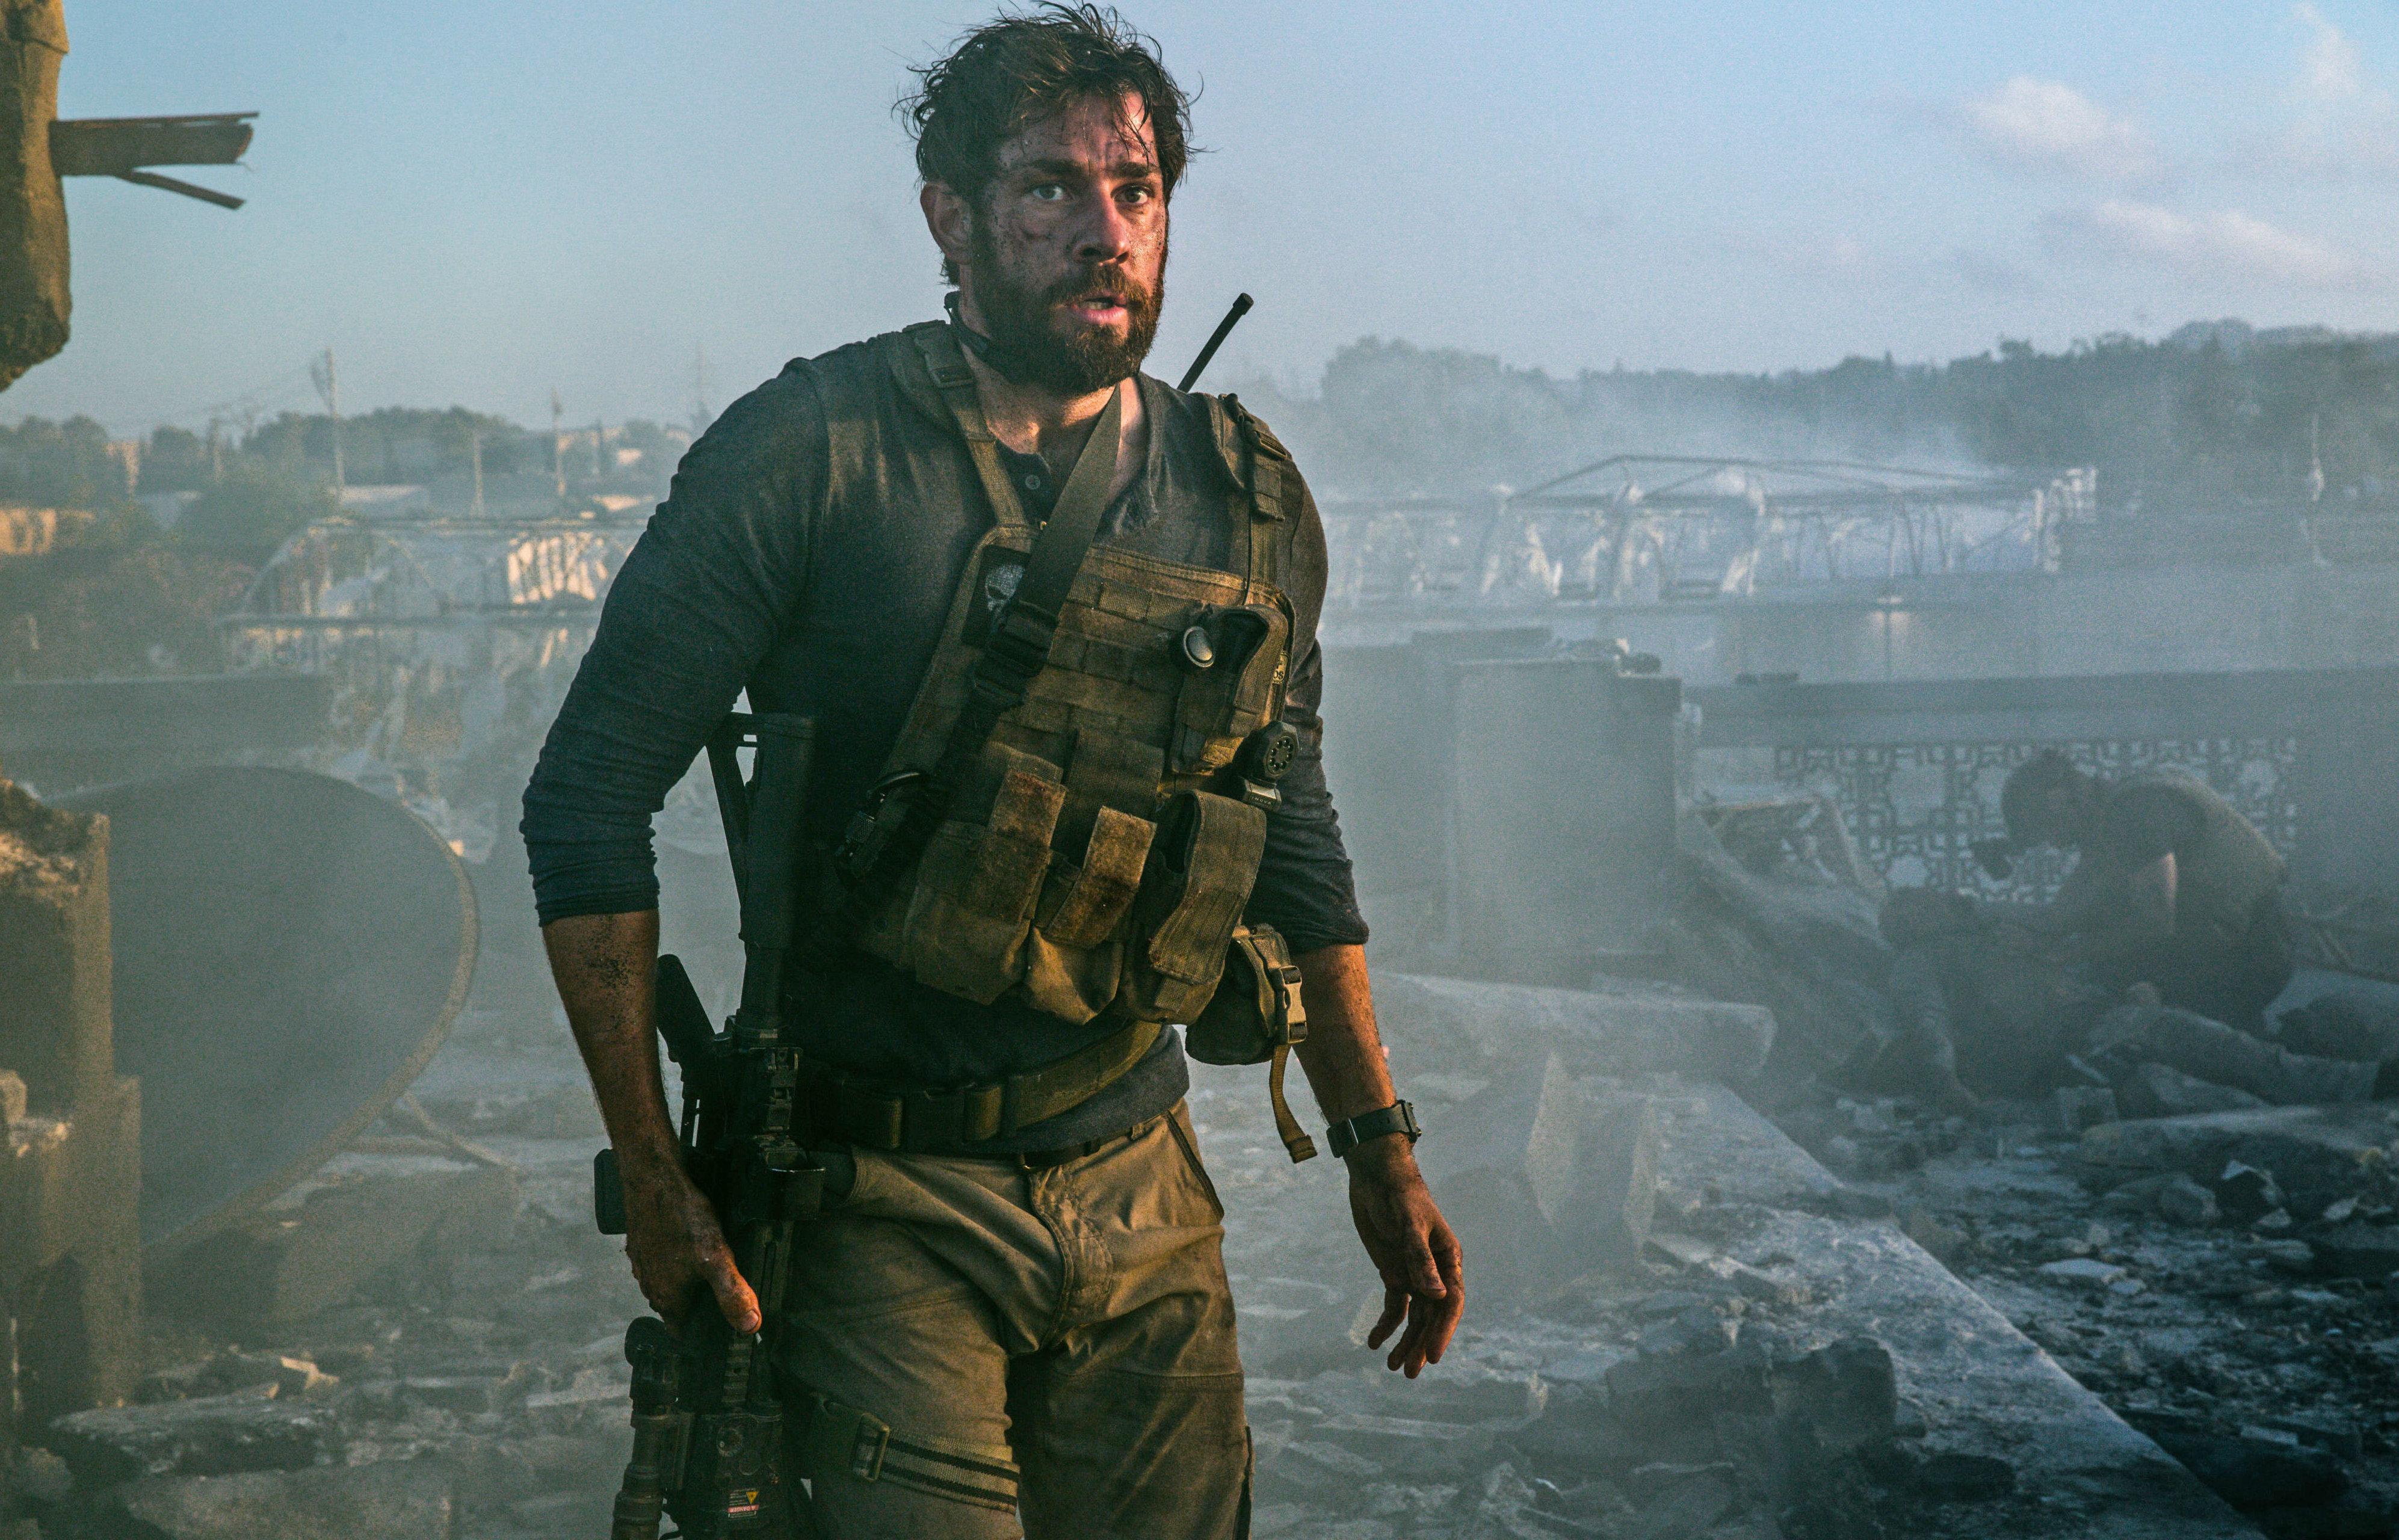 Tom Clancy's Jack Ryan, here portrayed by John Krasinski